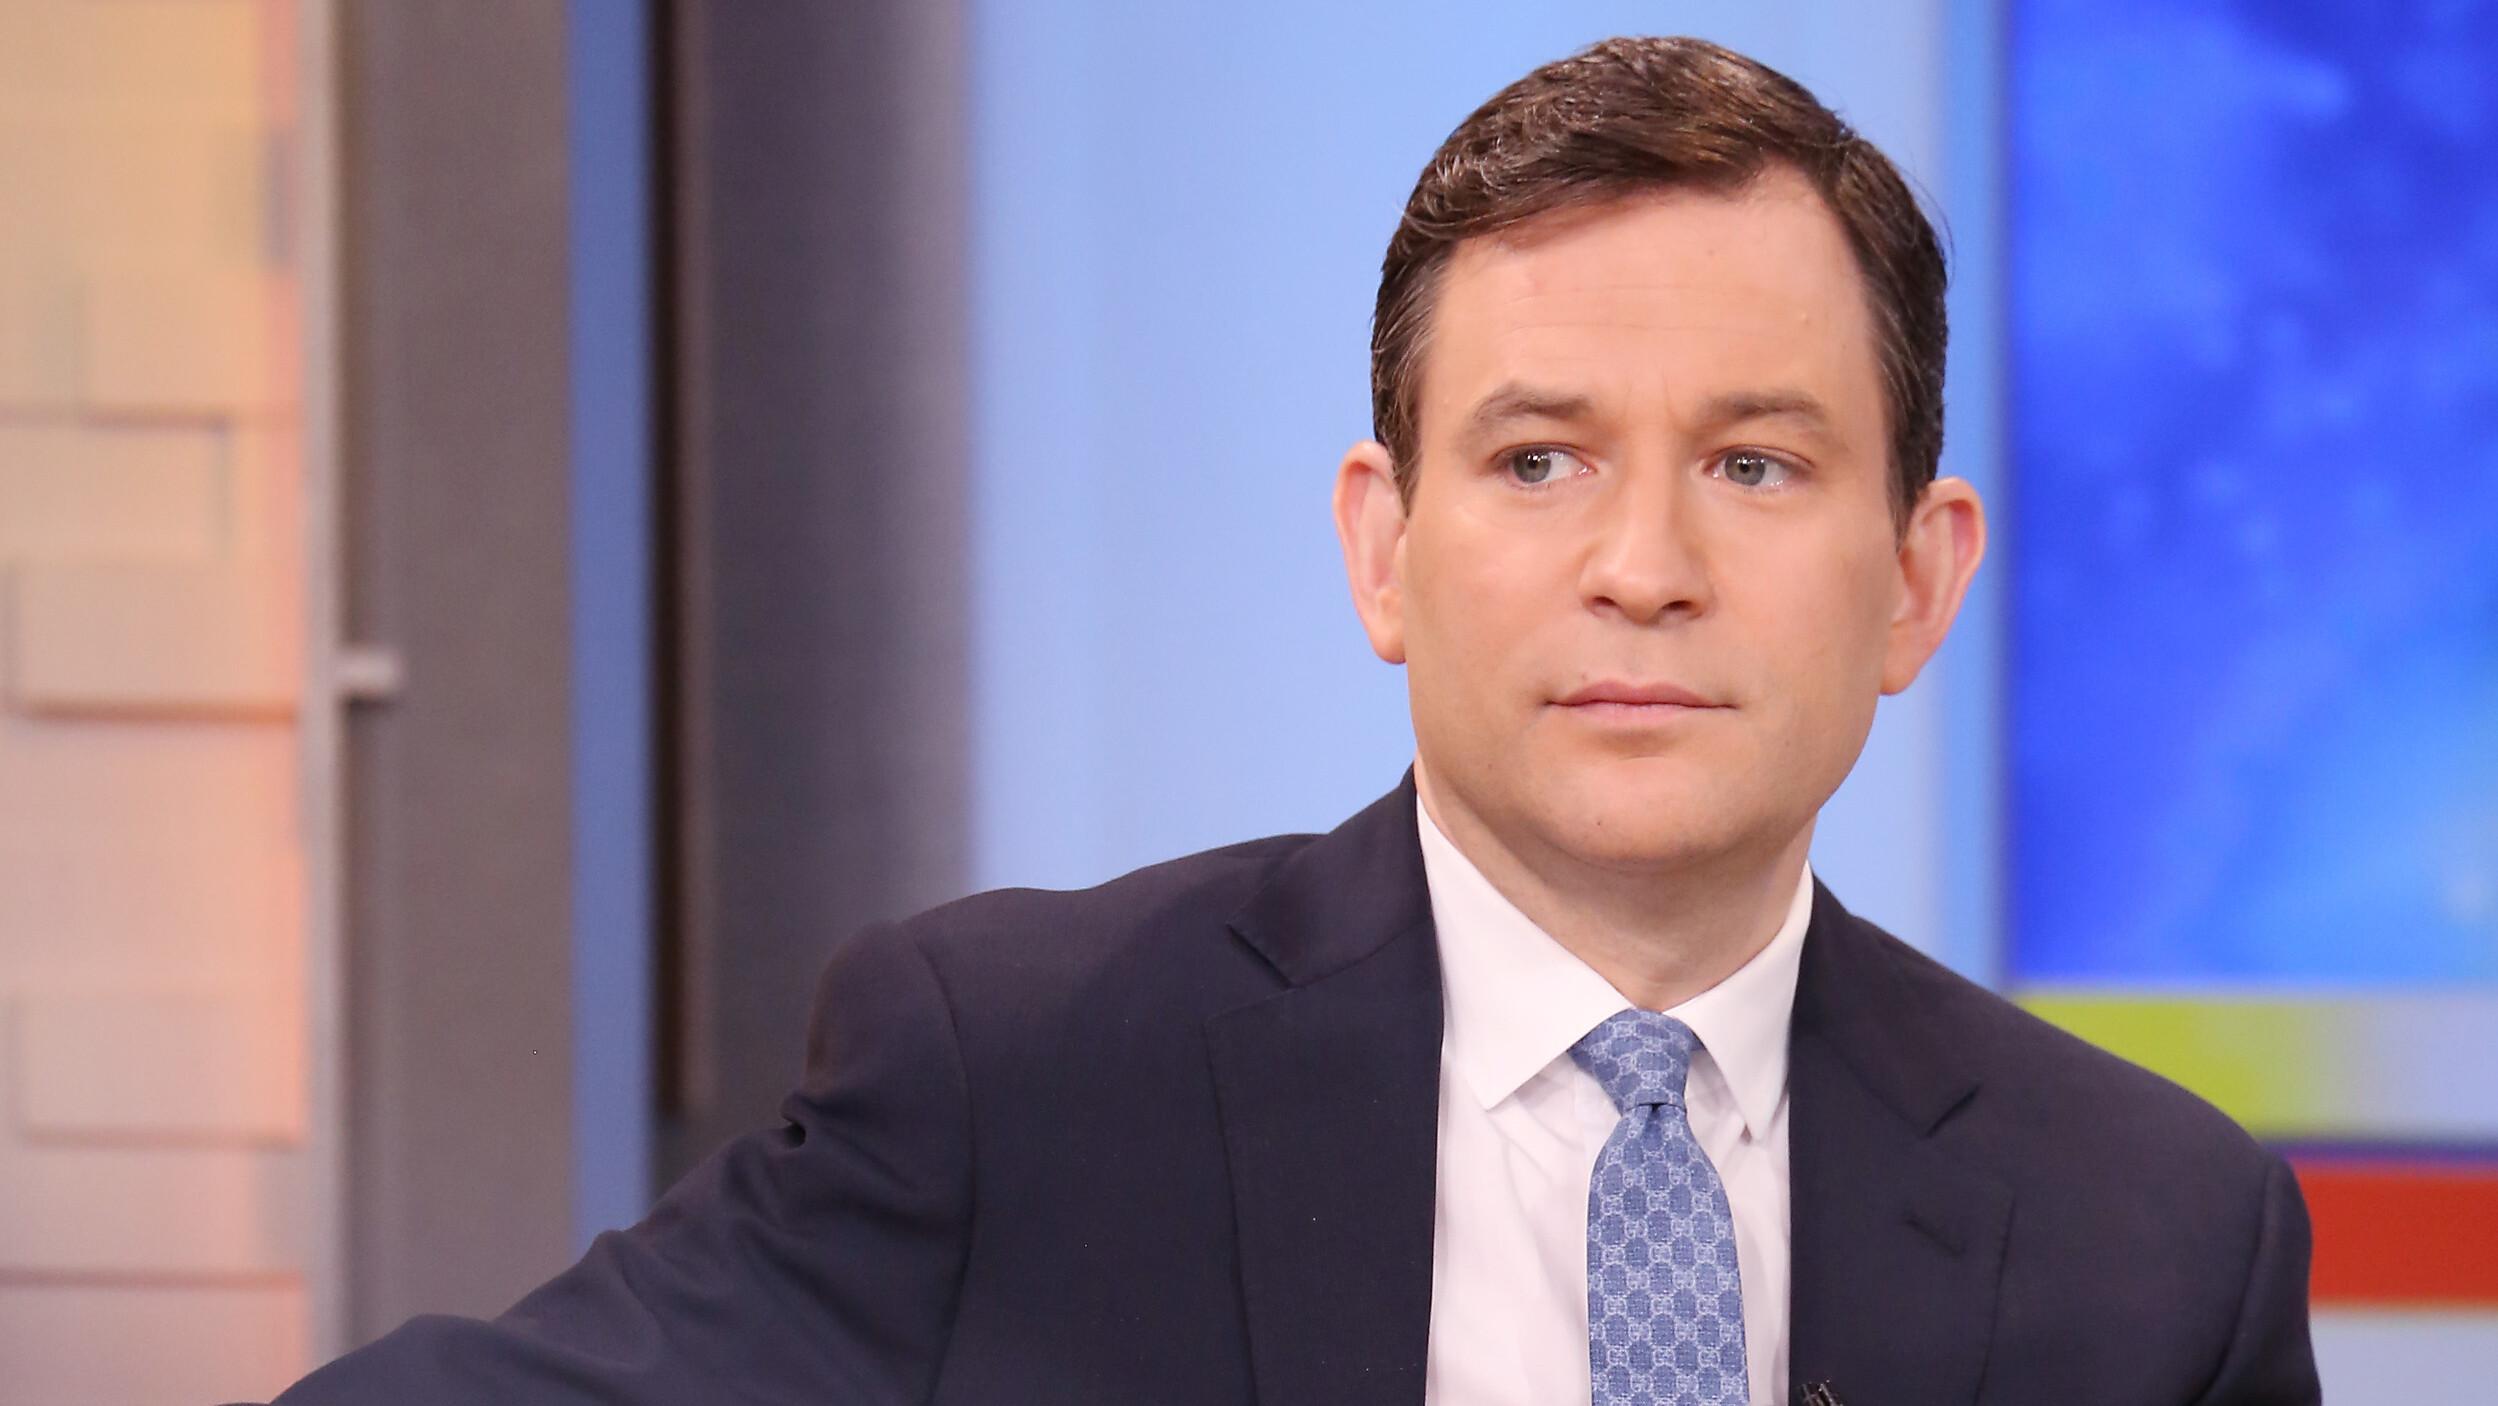 'Good Morning America' weekend anchor Dan Harris is leaving after 21 years